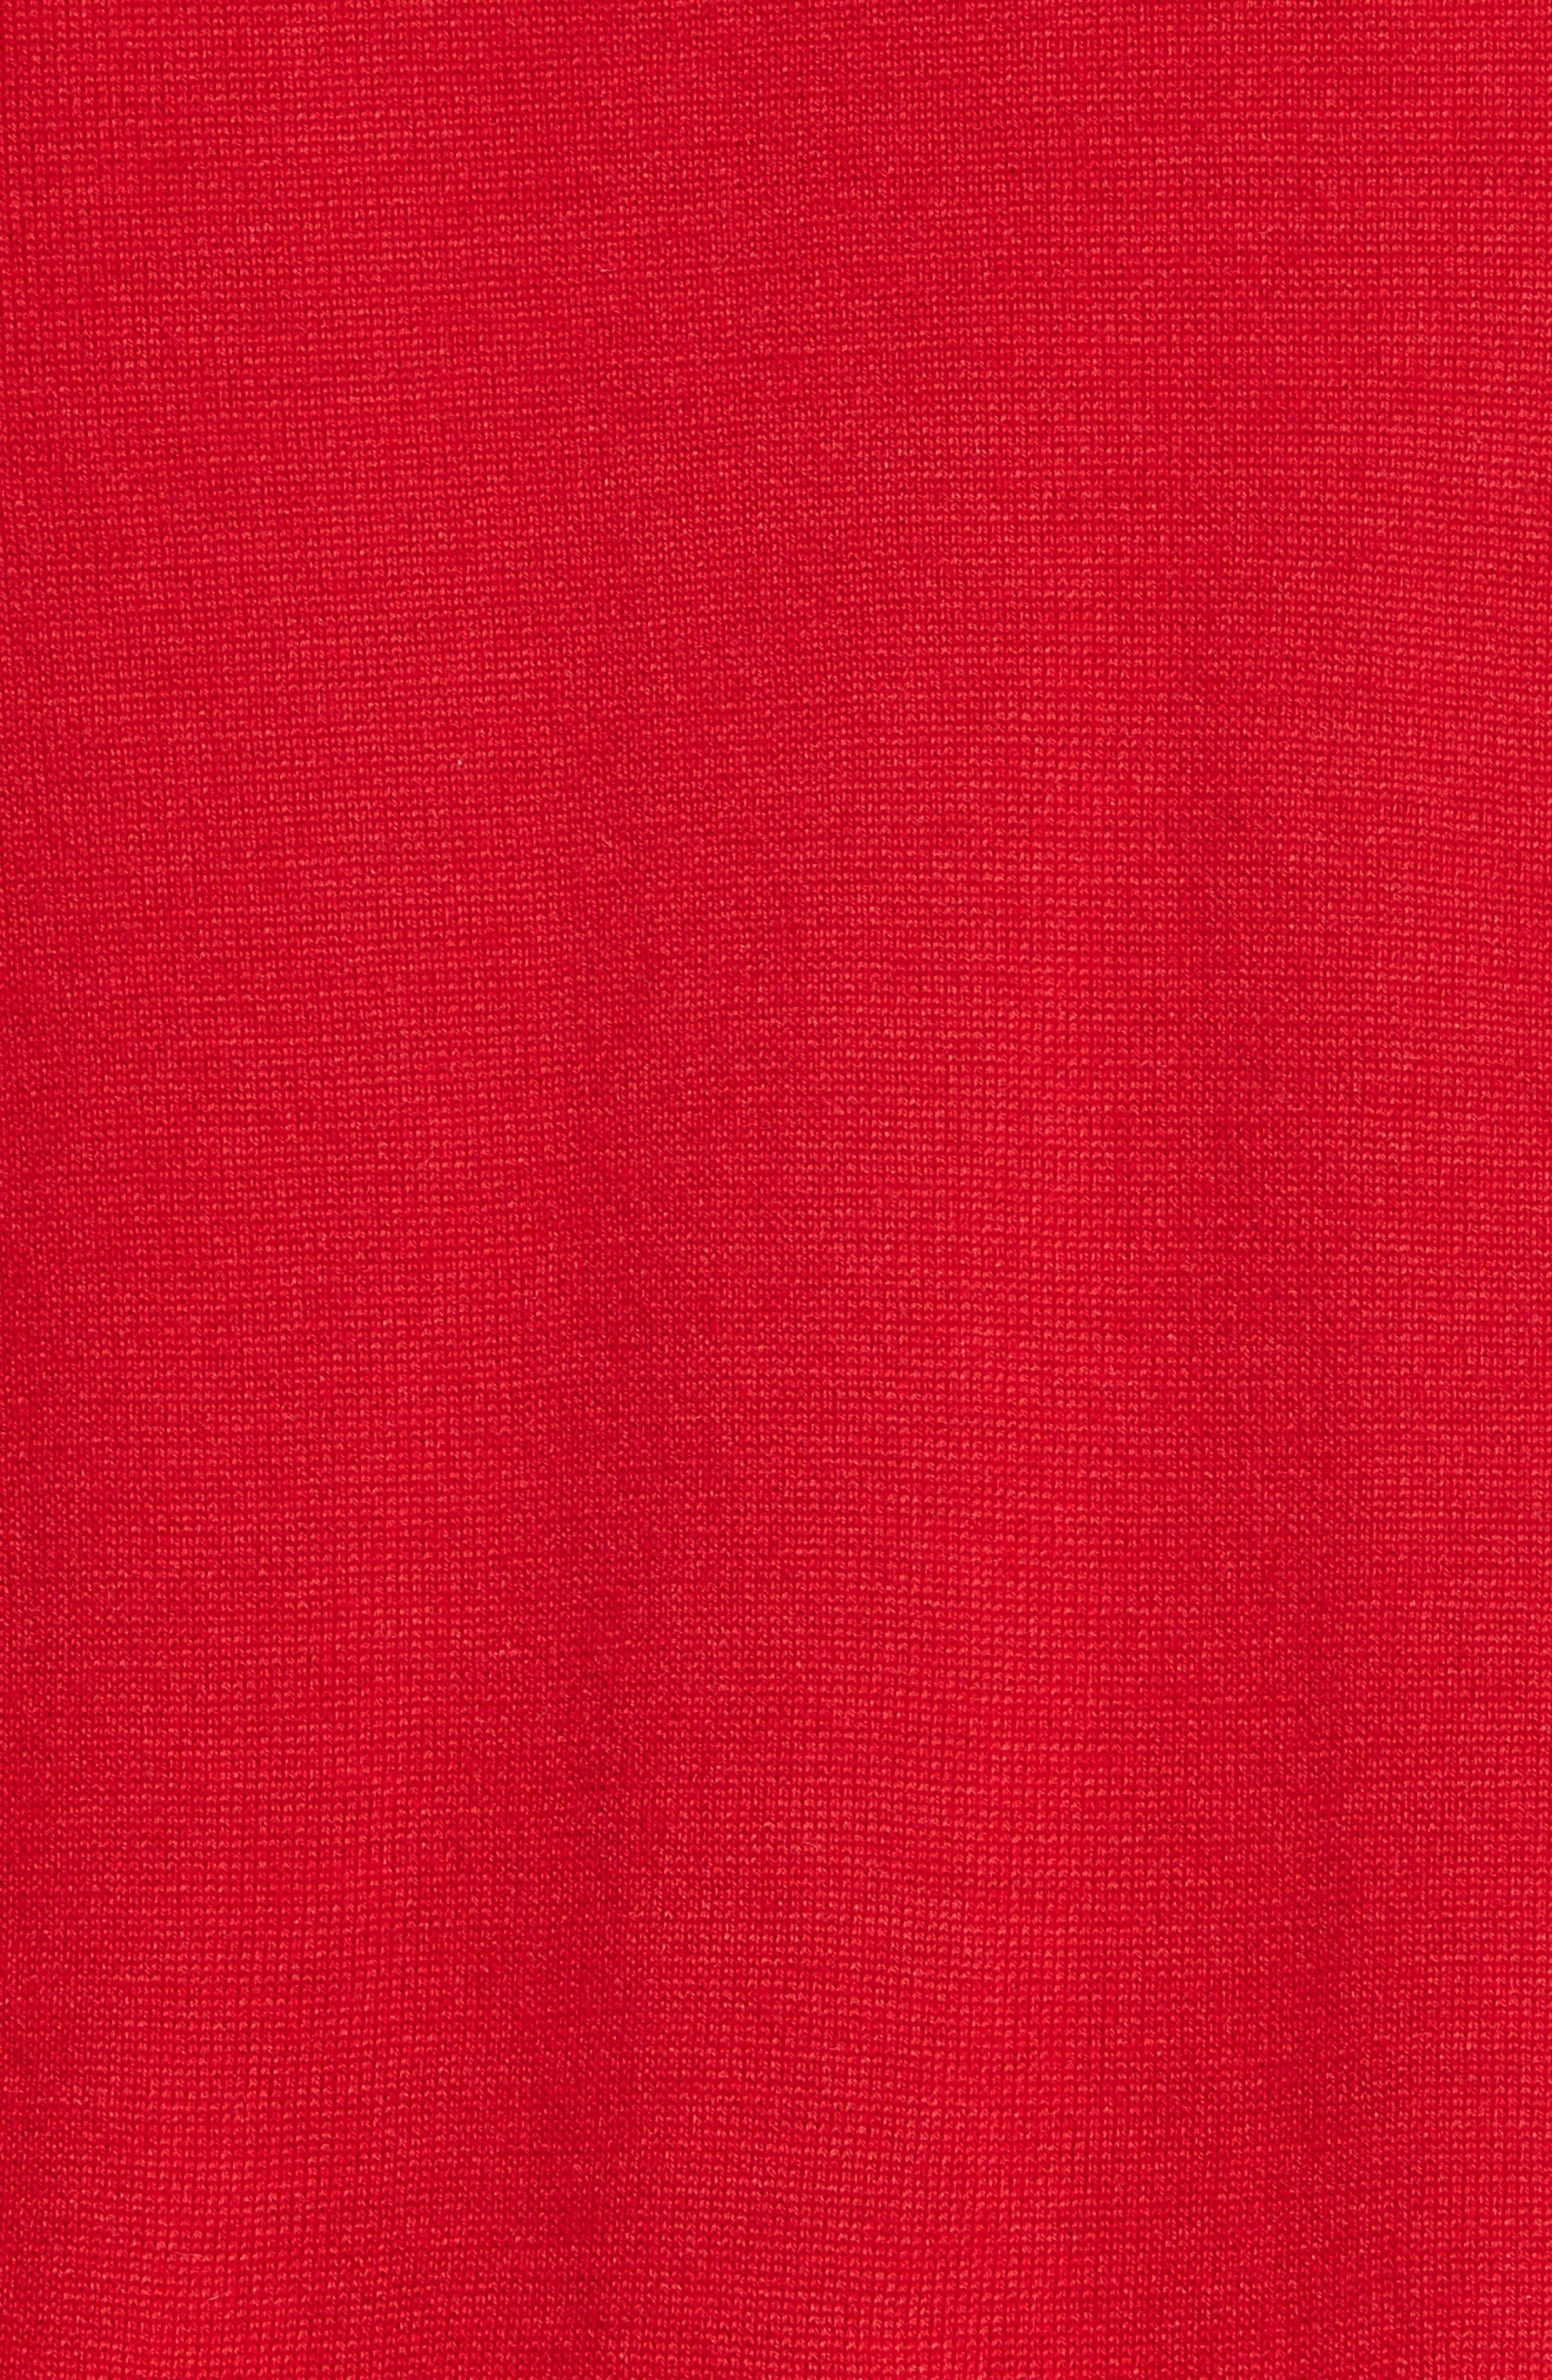 Felted Plait Merino, Silk & Cashmere Button Cardigan,                             Alternate thumbnail 5, color,                             600